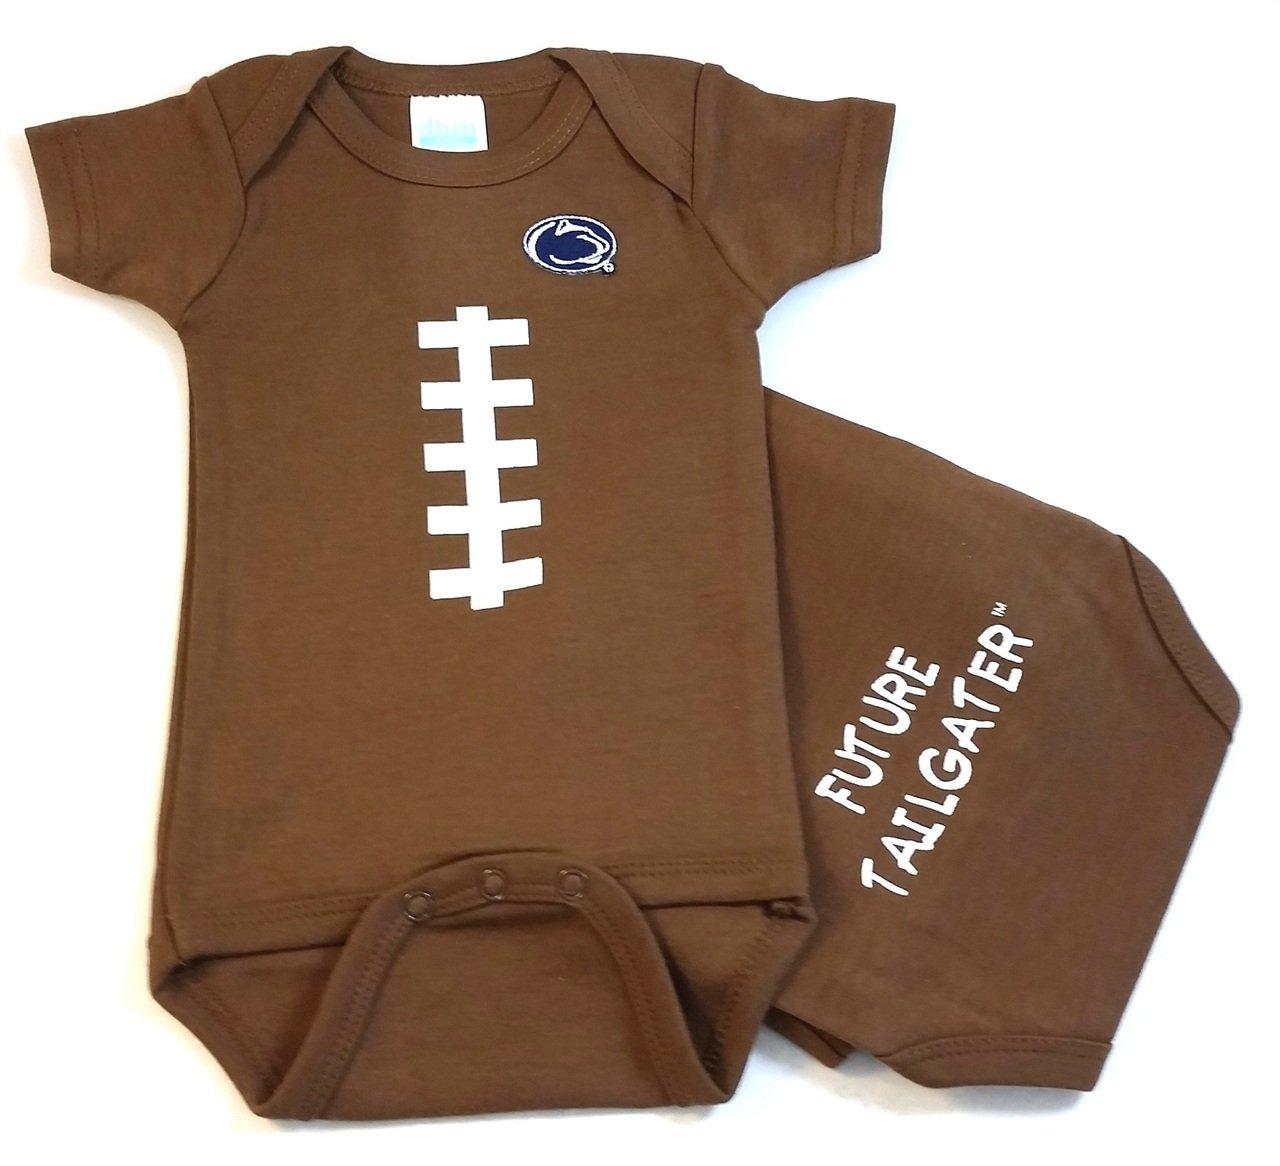 Amazon.com: Penn State Nittany Lions bebé Fútbol Onesie ...